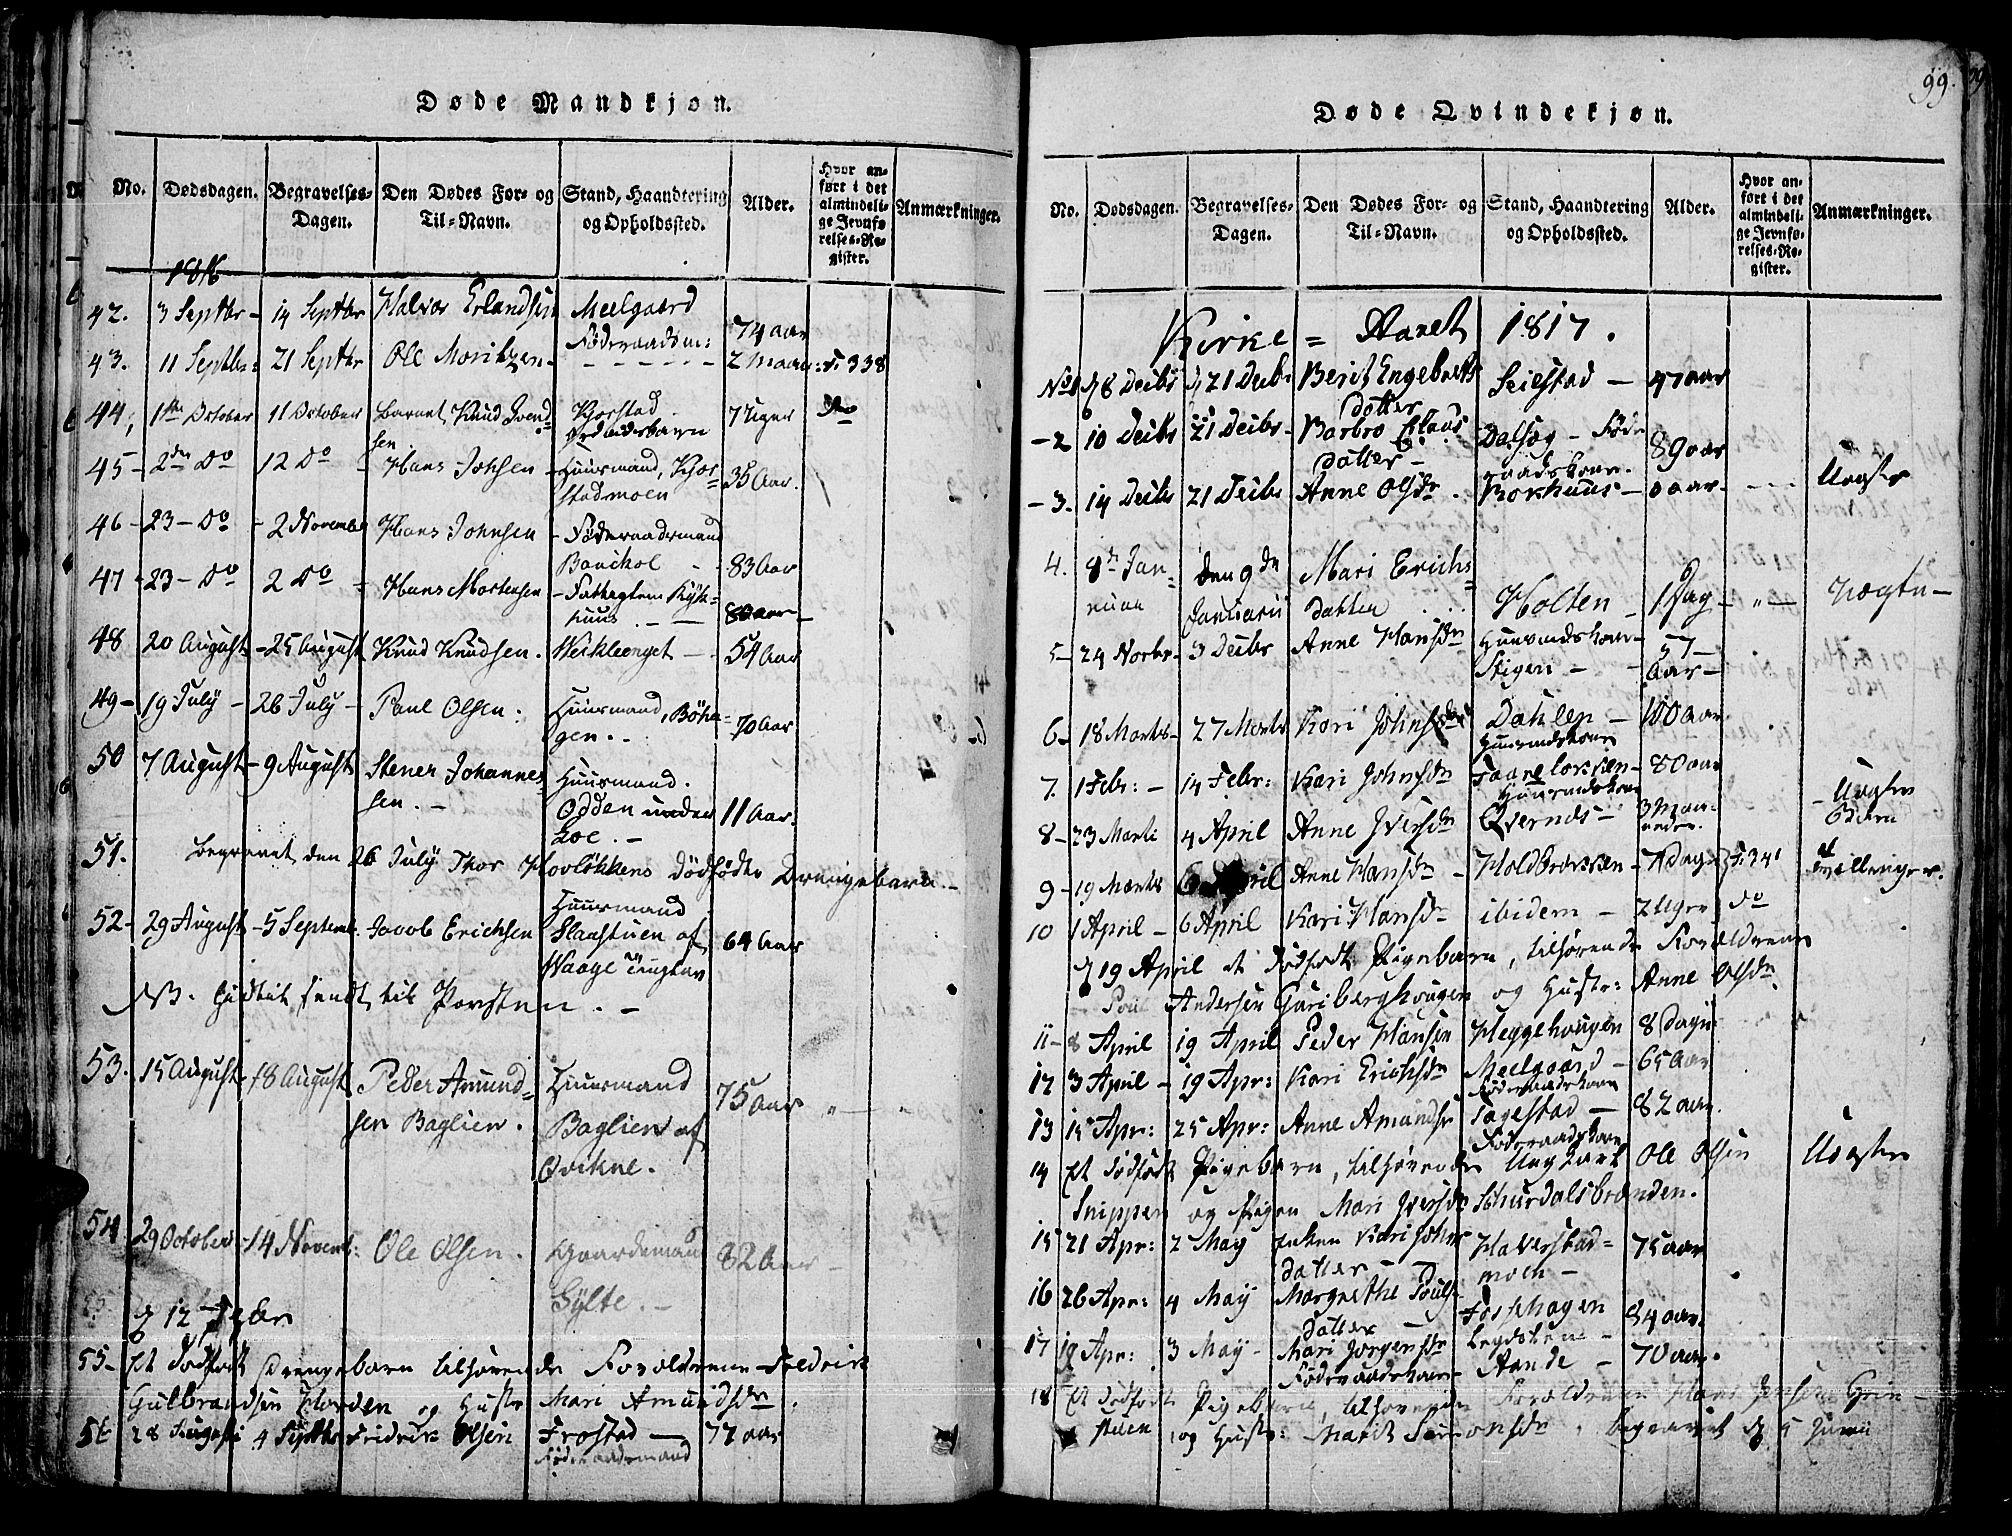 SAH, Fron prestekontor, H/Ha/Haa/L0002: Ministerialbok nr. 2, 1816-1827, s. 99